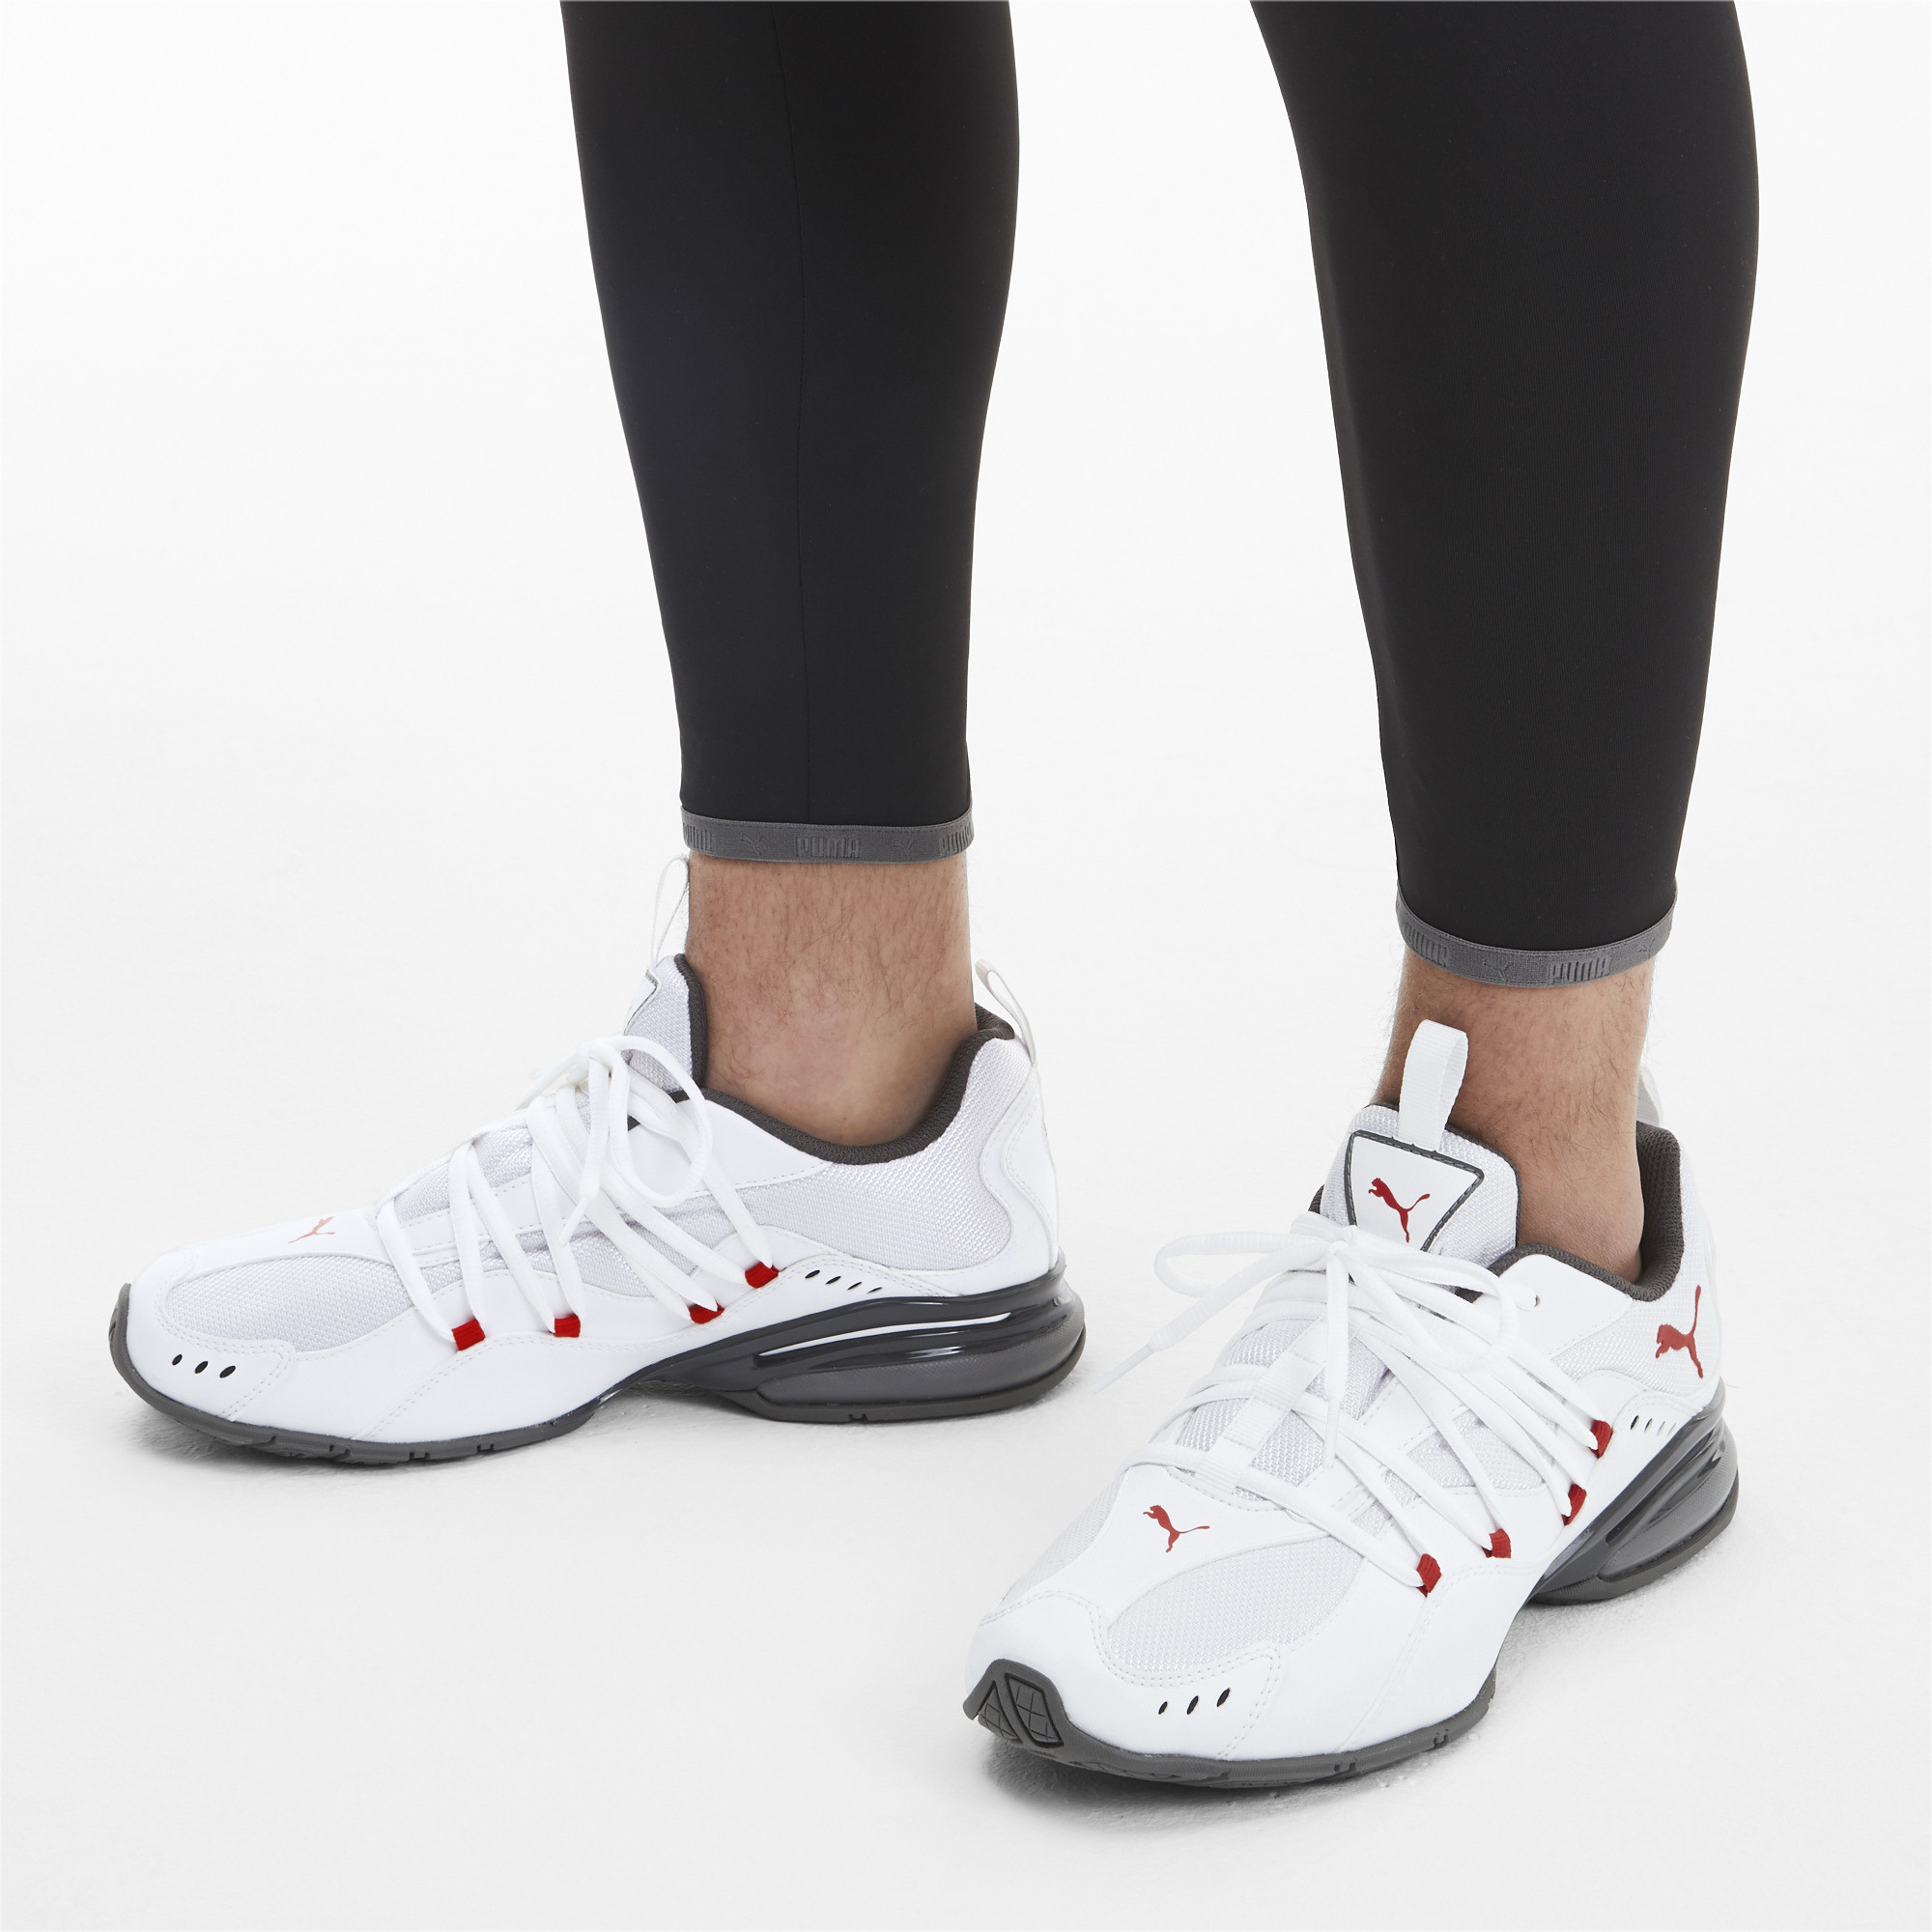 PUMA-Silverion-Men-s-Running-Shoes-Men-Shoe-Running thumbnail 4